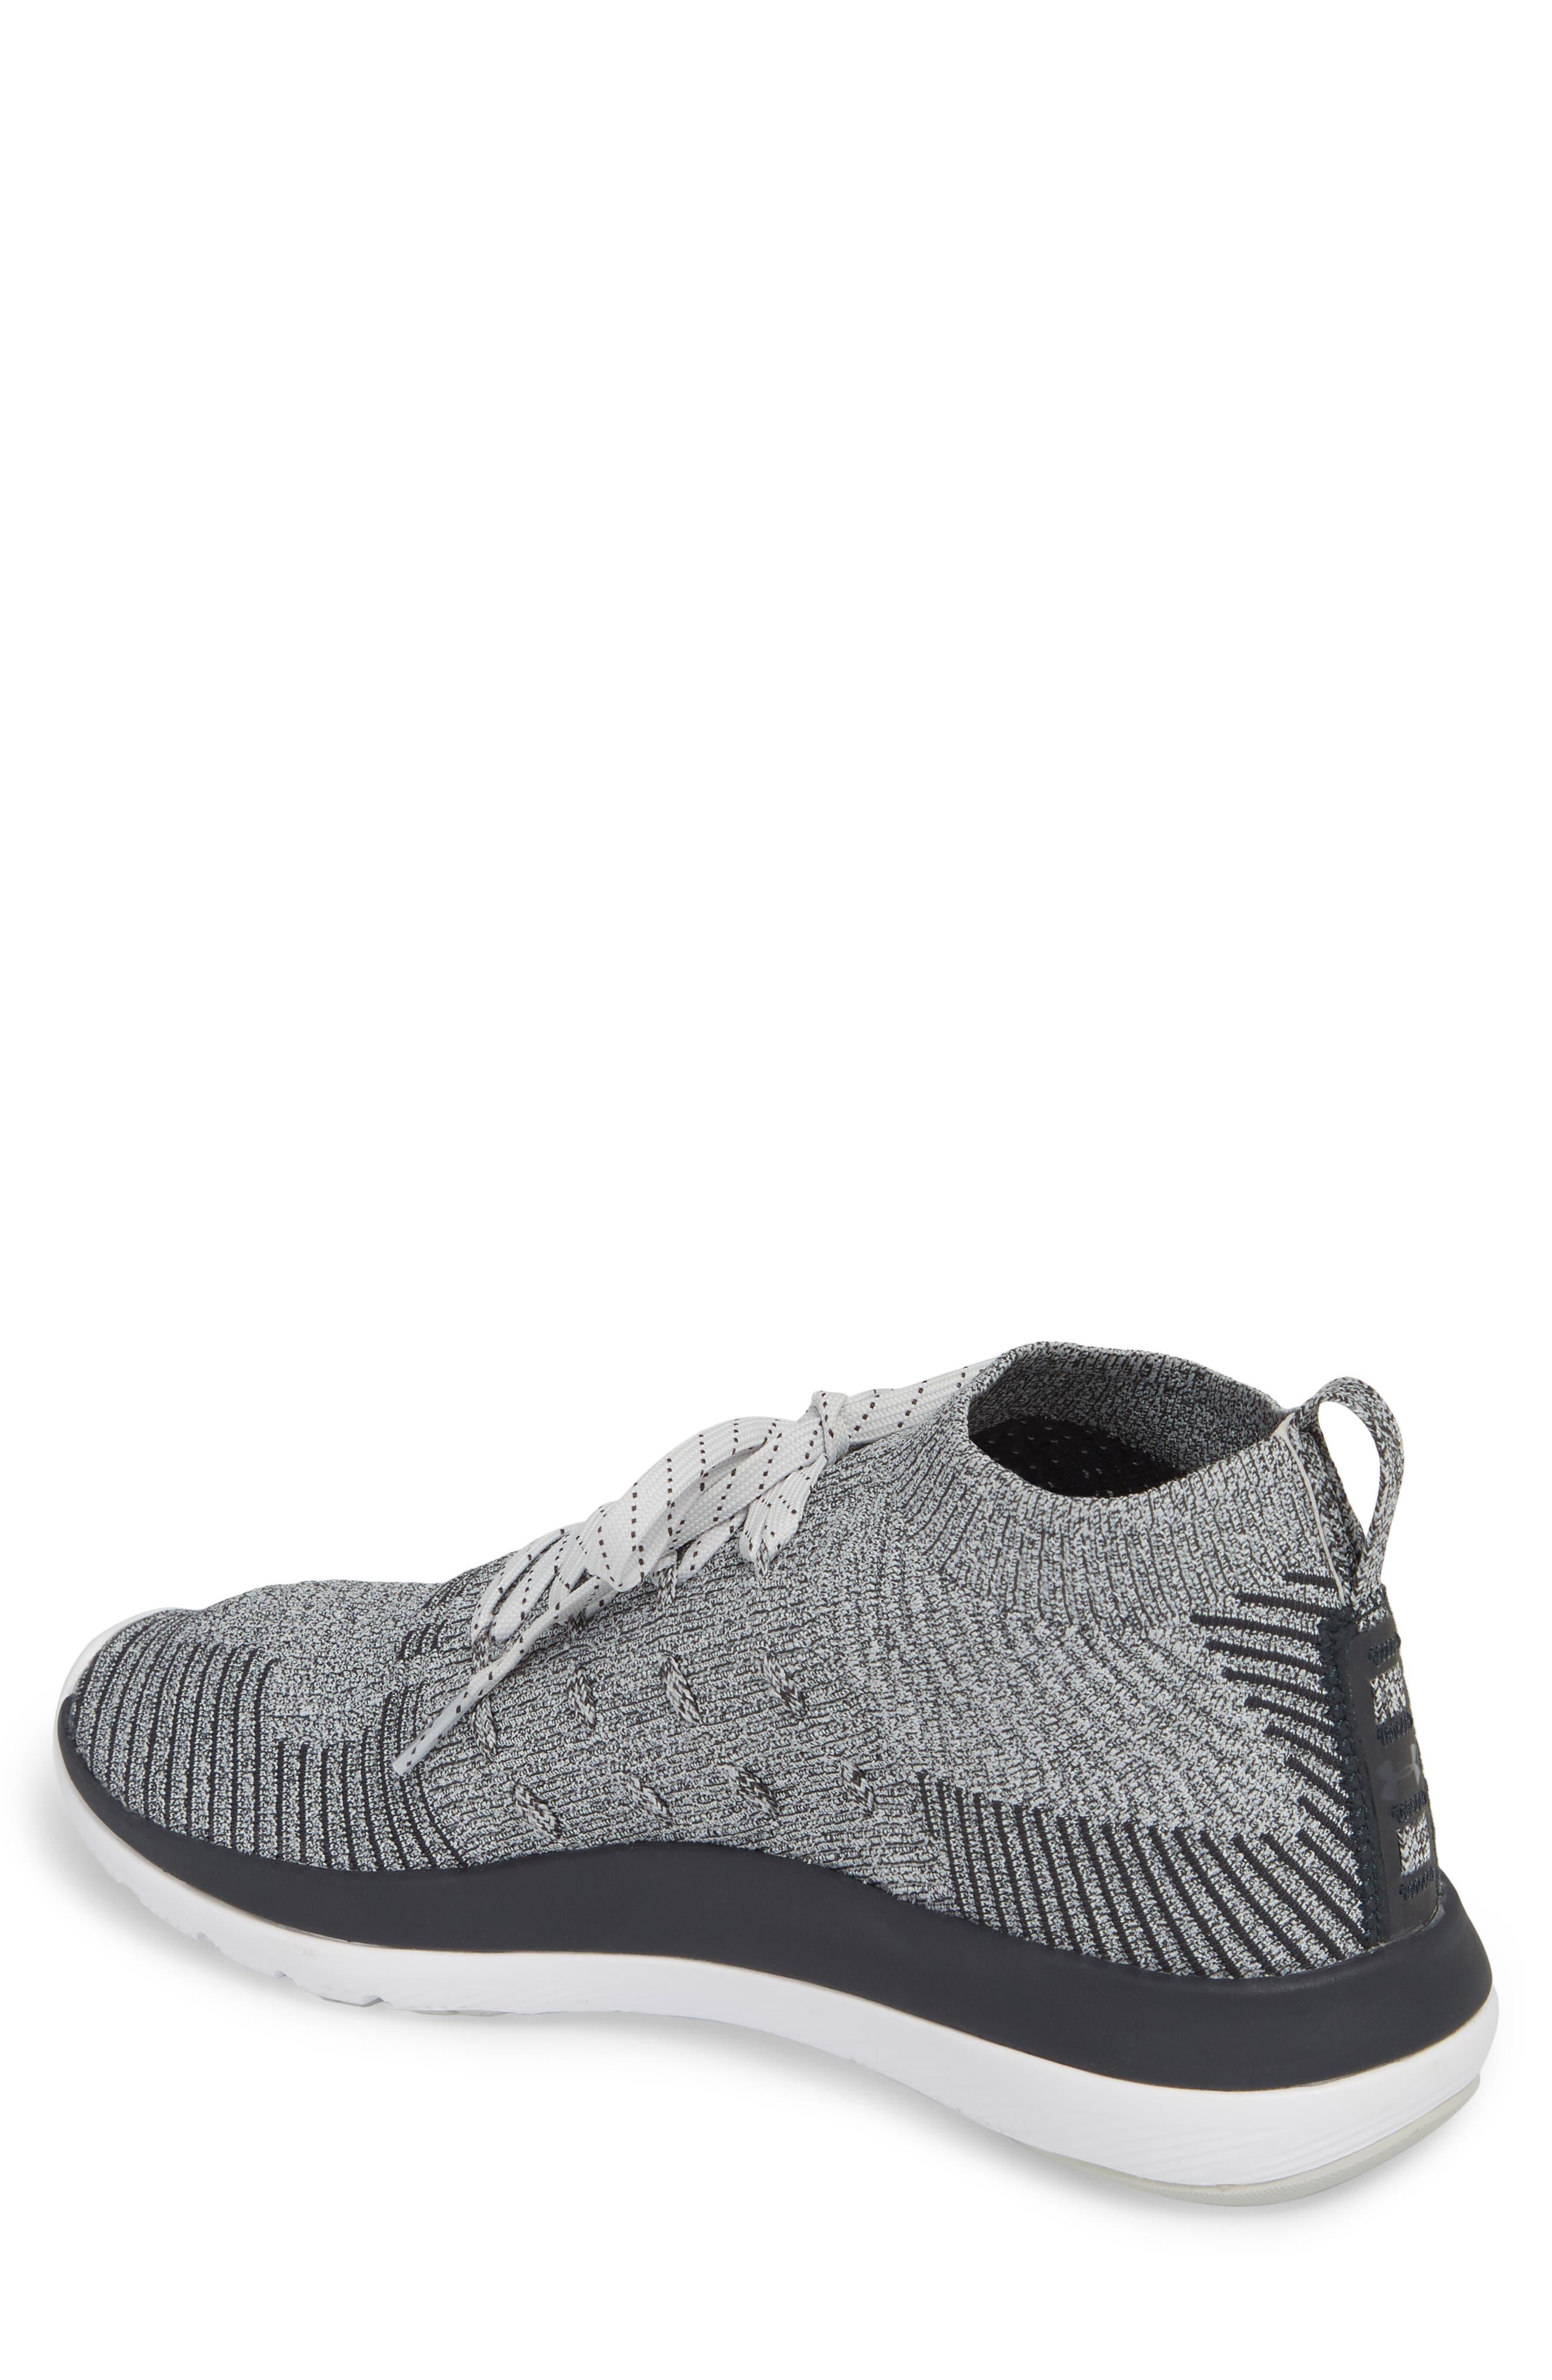 Slingflex Rise Sneaker,                             Alternate thumbnail 2, color,                             ELEMENTAL/ ANTHRACITE